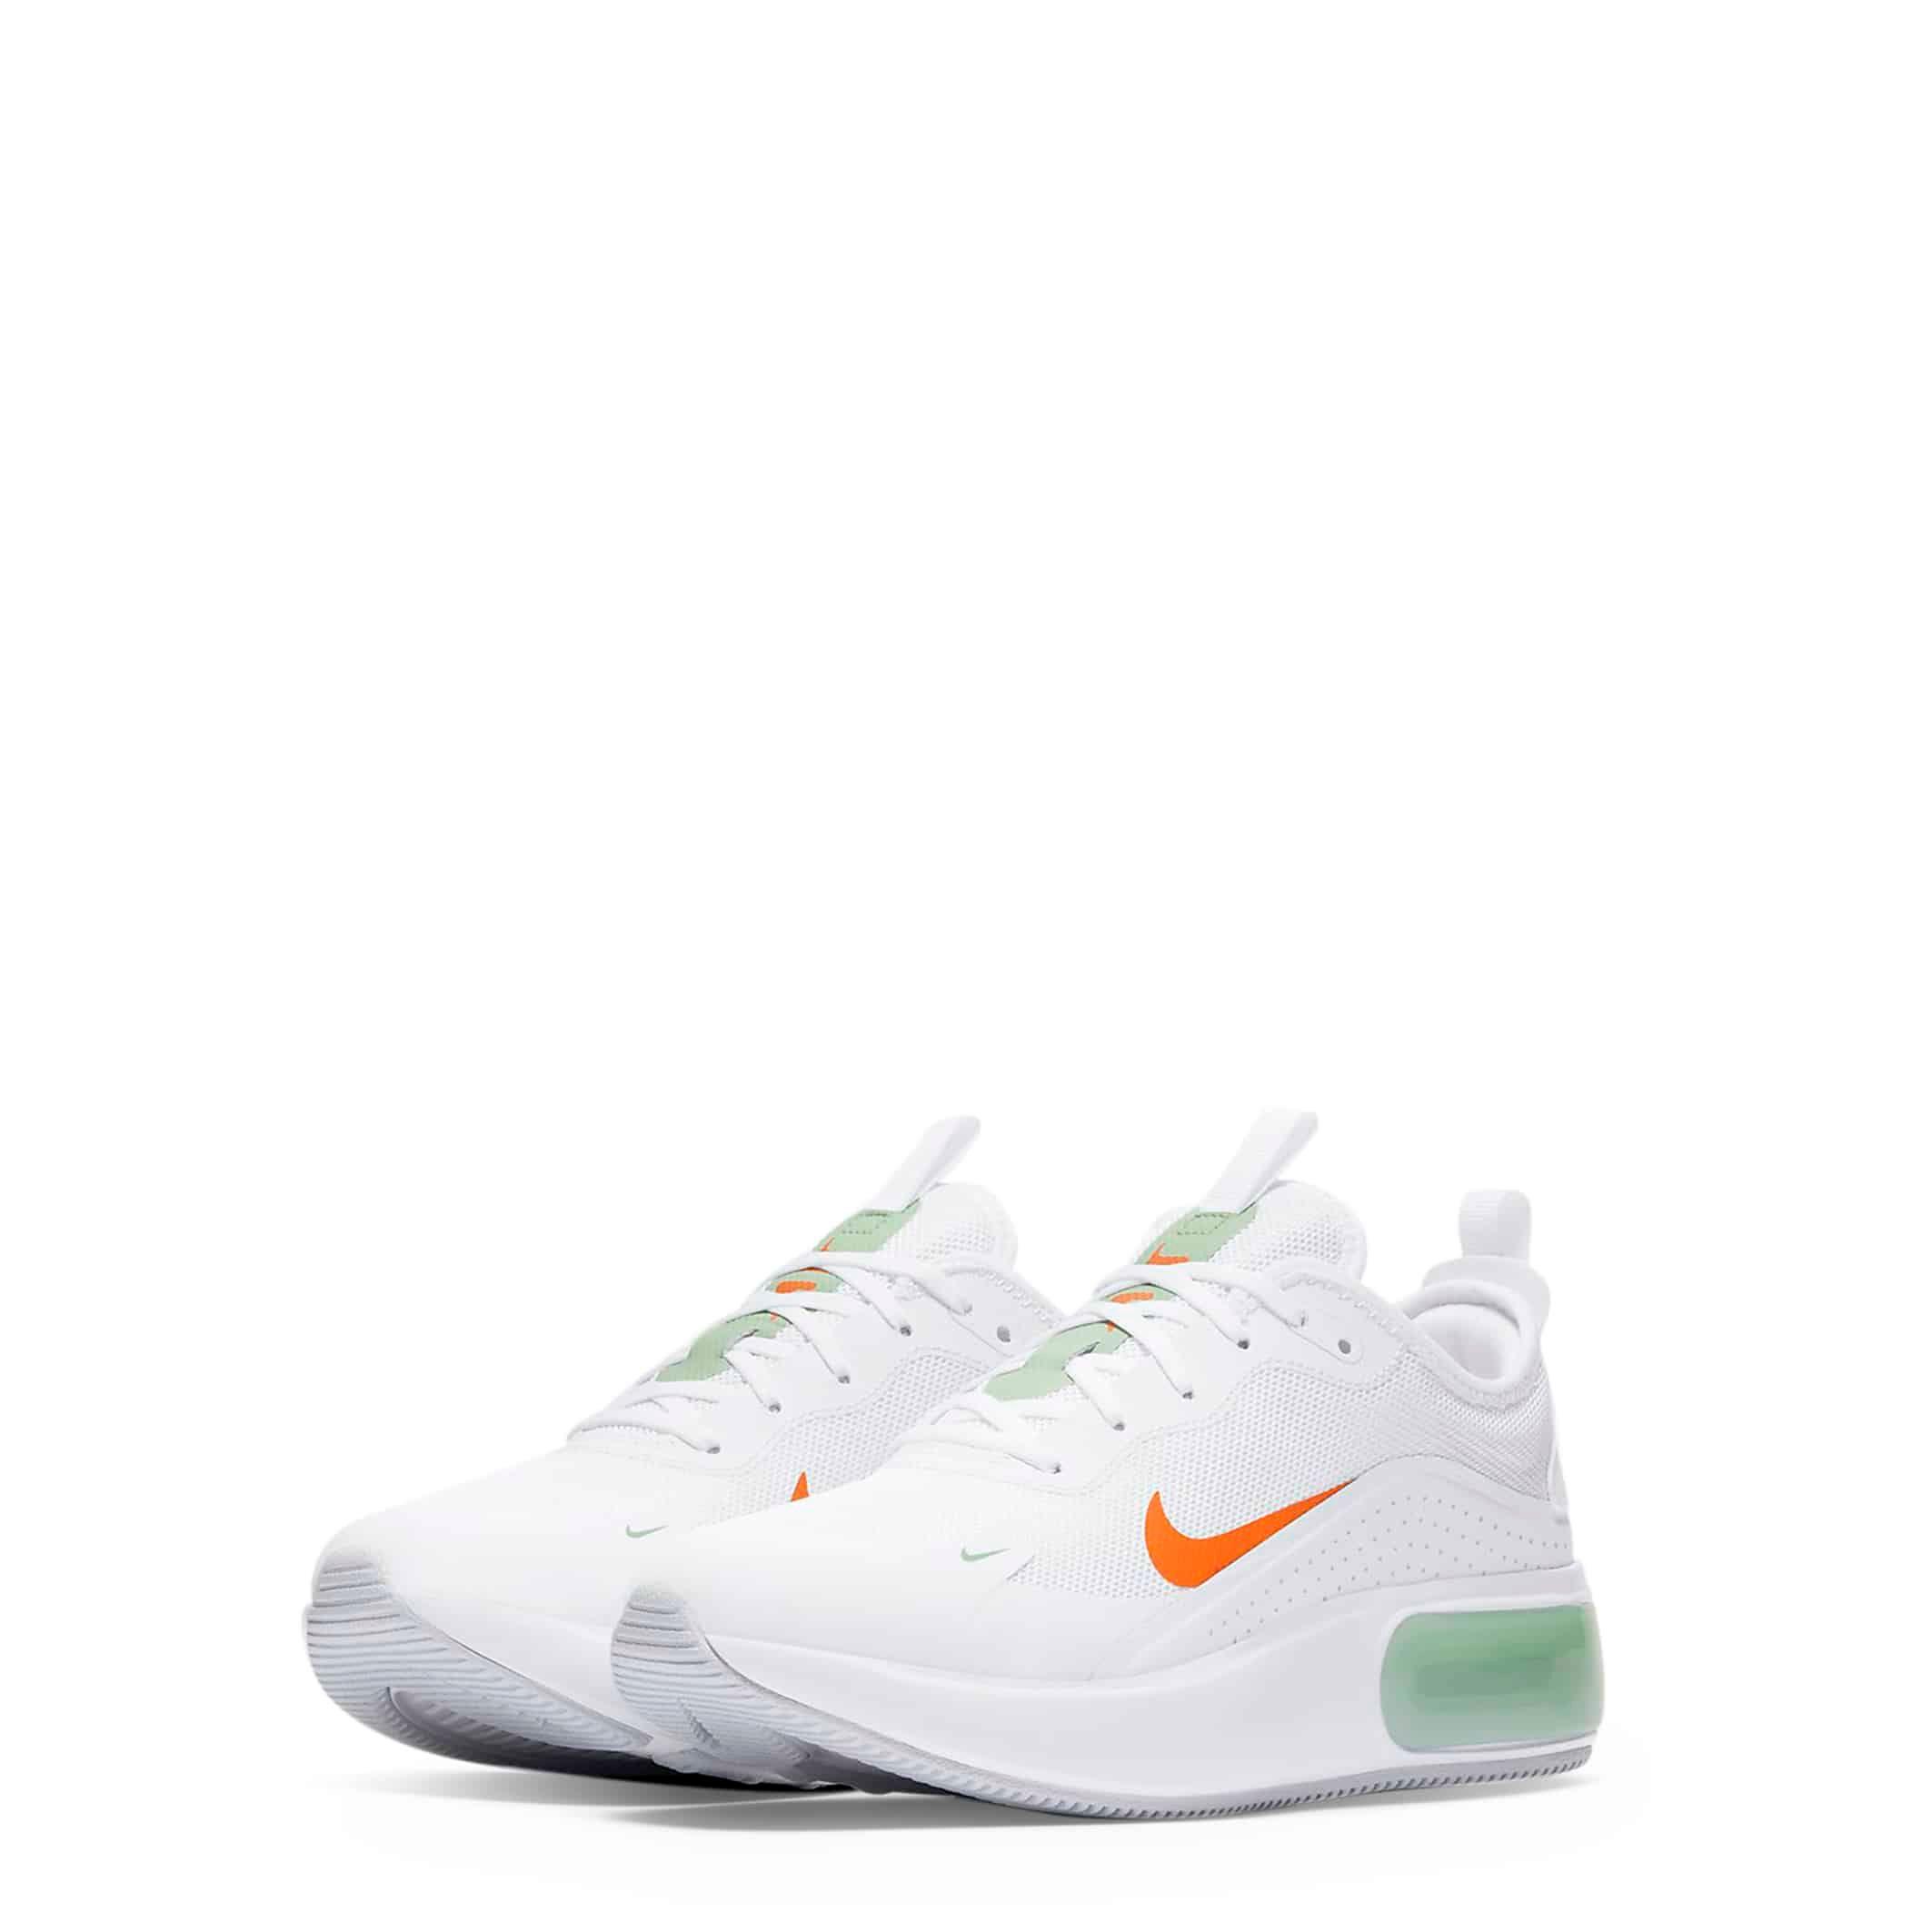 Nike – AirMaxDia